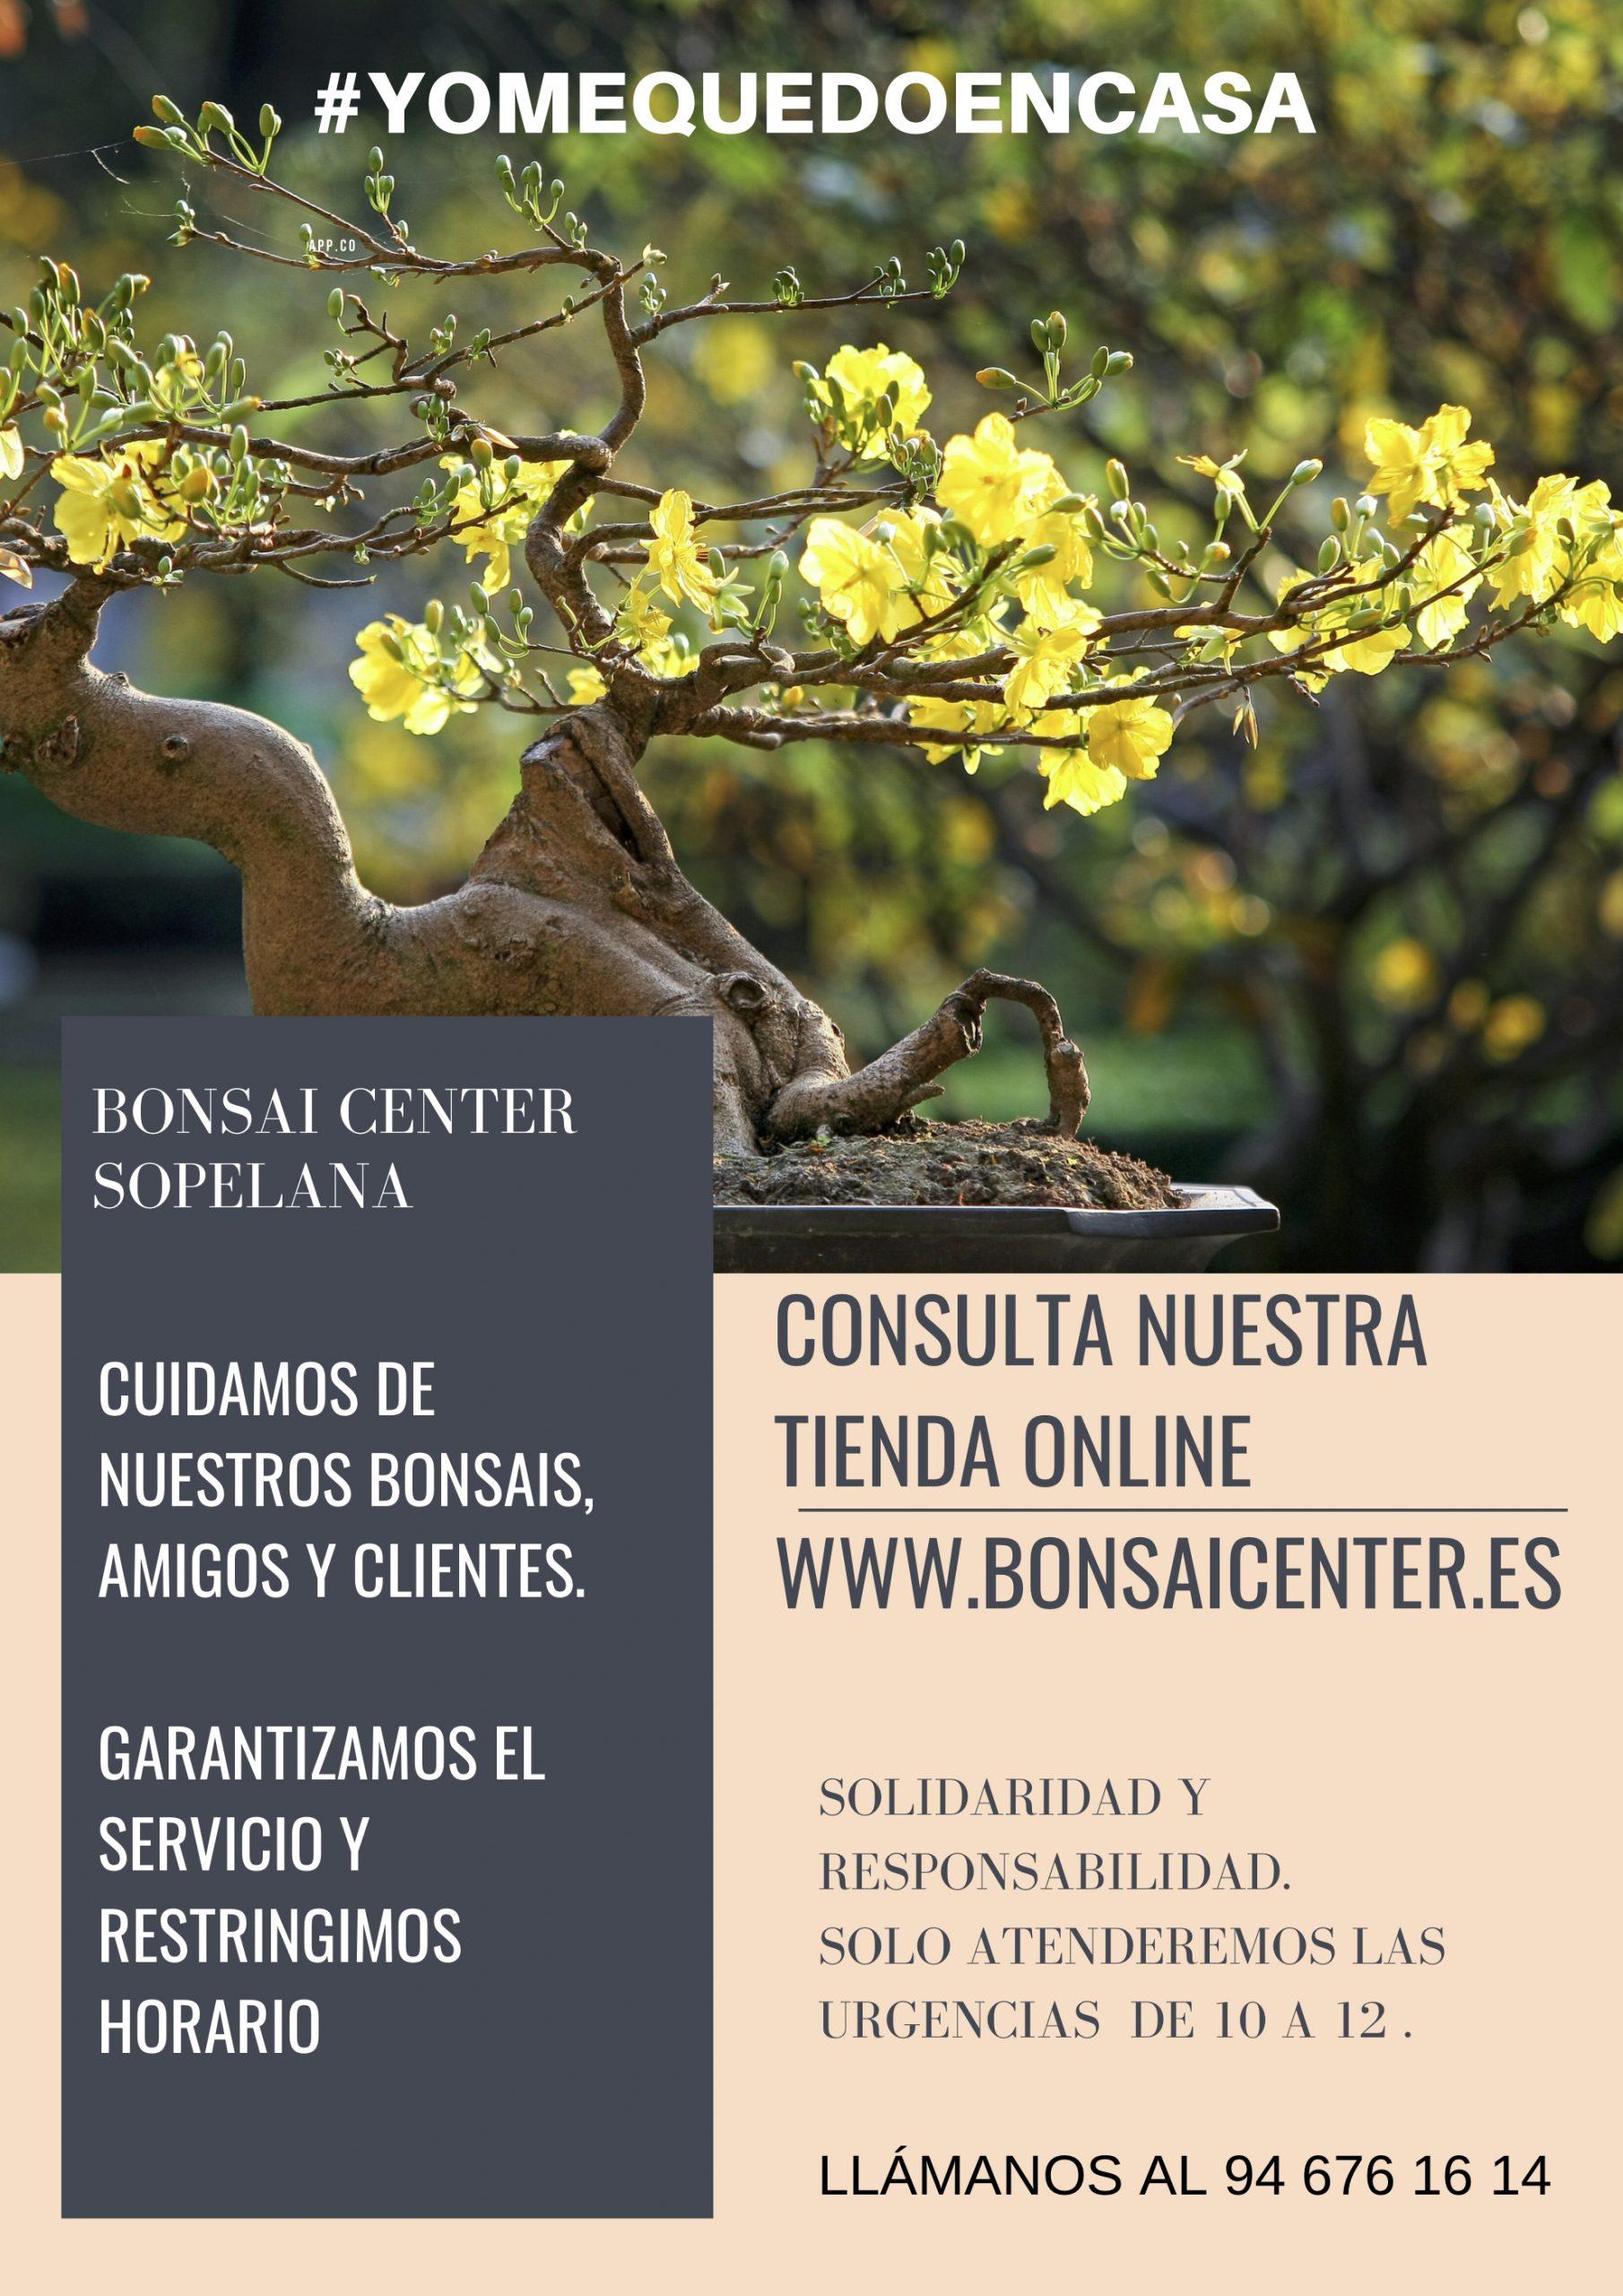 Comunicado Bonsai Center Sopelana